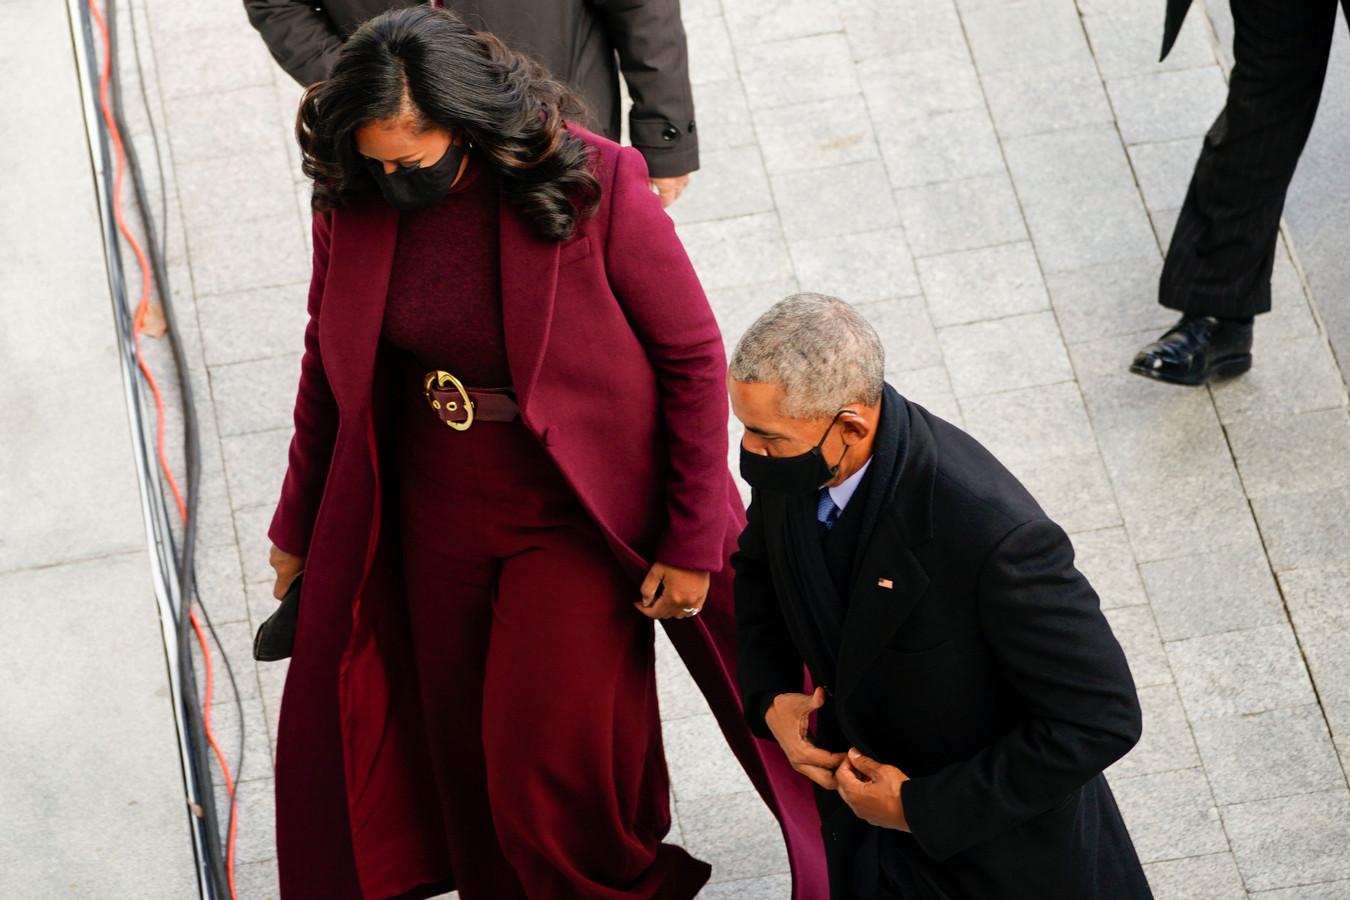 Former President Barack Obama and his wife Michelle arrives at the U.S. Capitol ahead of President-elect Joe Bidenâęs inauguration at the U.S. Capitol in Washington, Wednesday, Jan. 20, 2021. (Melina Mara/The Washington Post via AP, Pool)